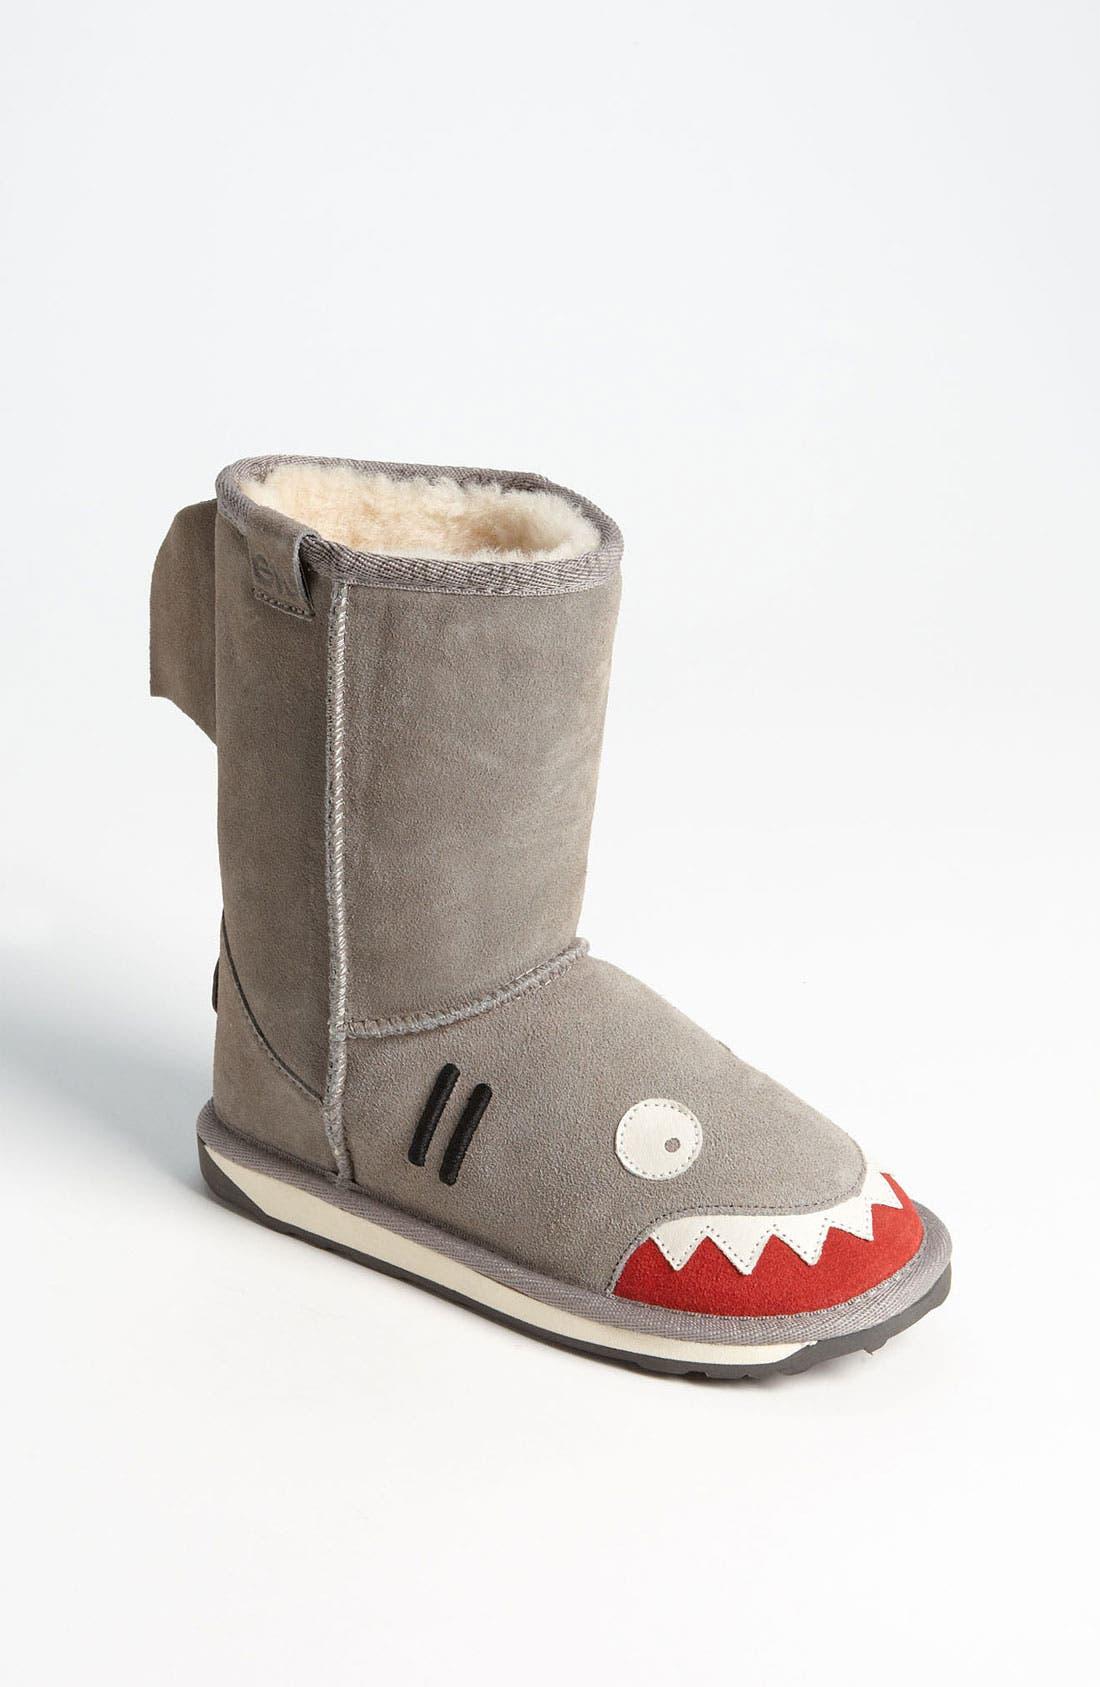 Alternate Image 1 Selected - EMU Australia 'Little Creatures - Shark' Boot (Toddler, Little Kid & Big Kid)